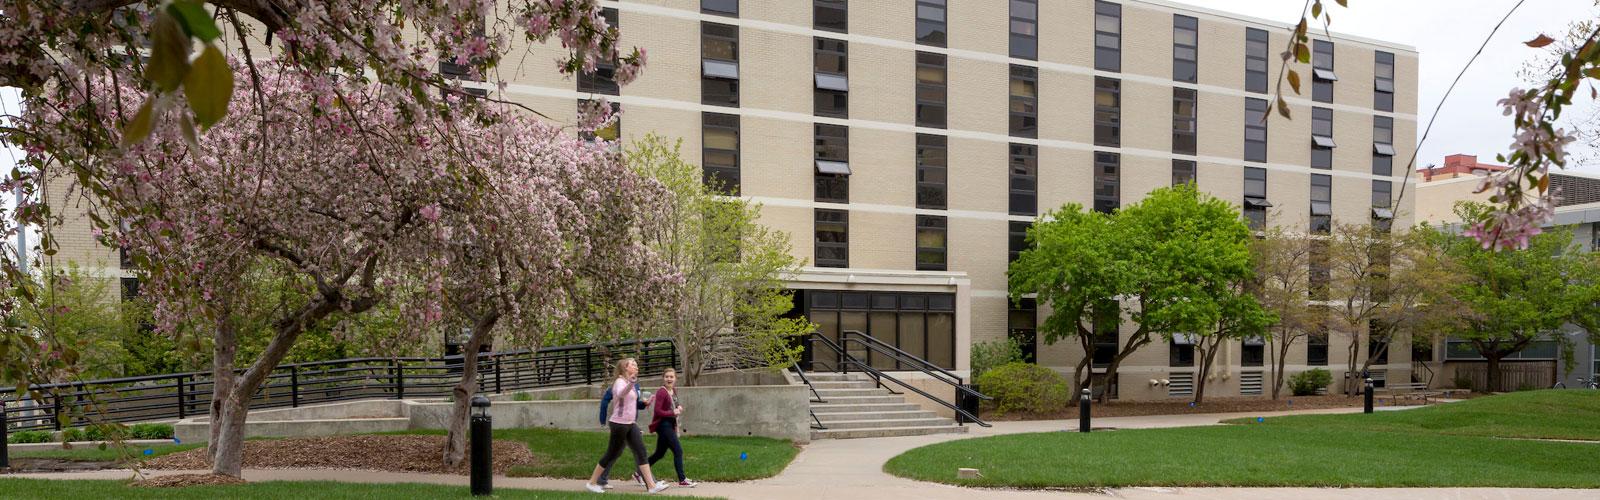 Deglman residence hall Creighton University